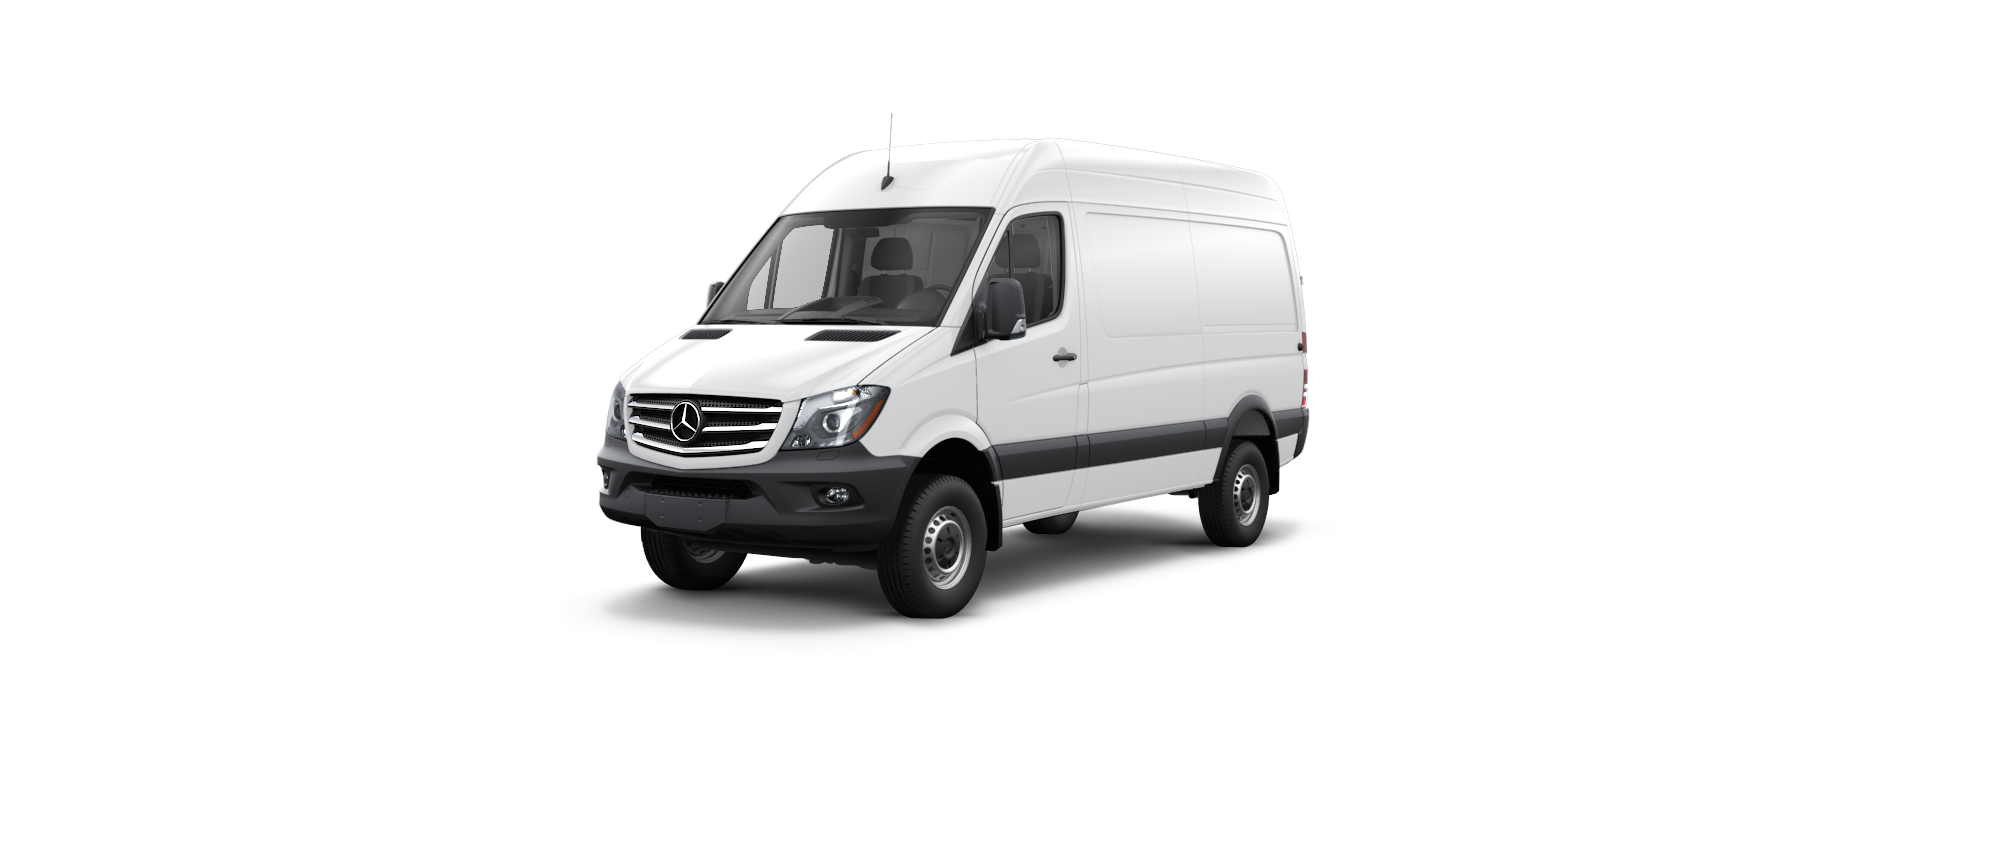 Demo 2017 mercedes benz sprinter 2500 cargo sprinter v6 for 2017 mercedes benz 2500 high roof v6 4wd cargo van